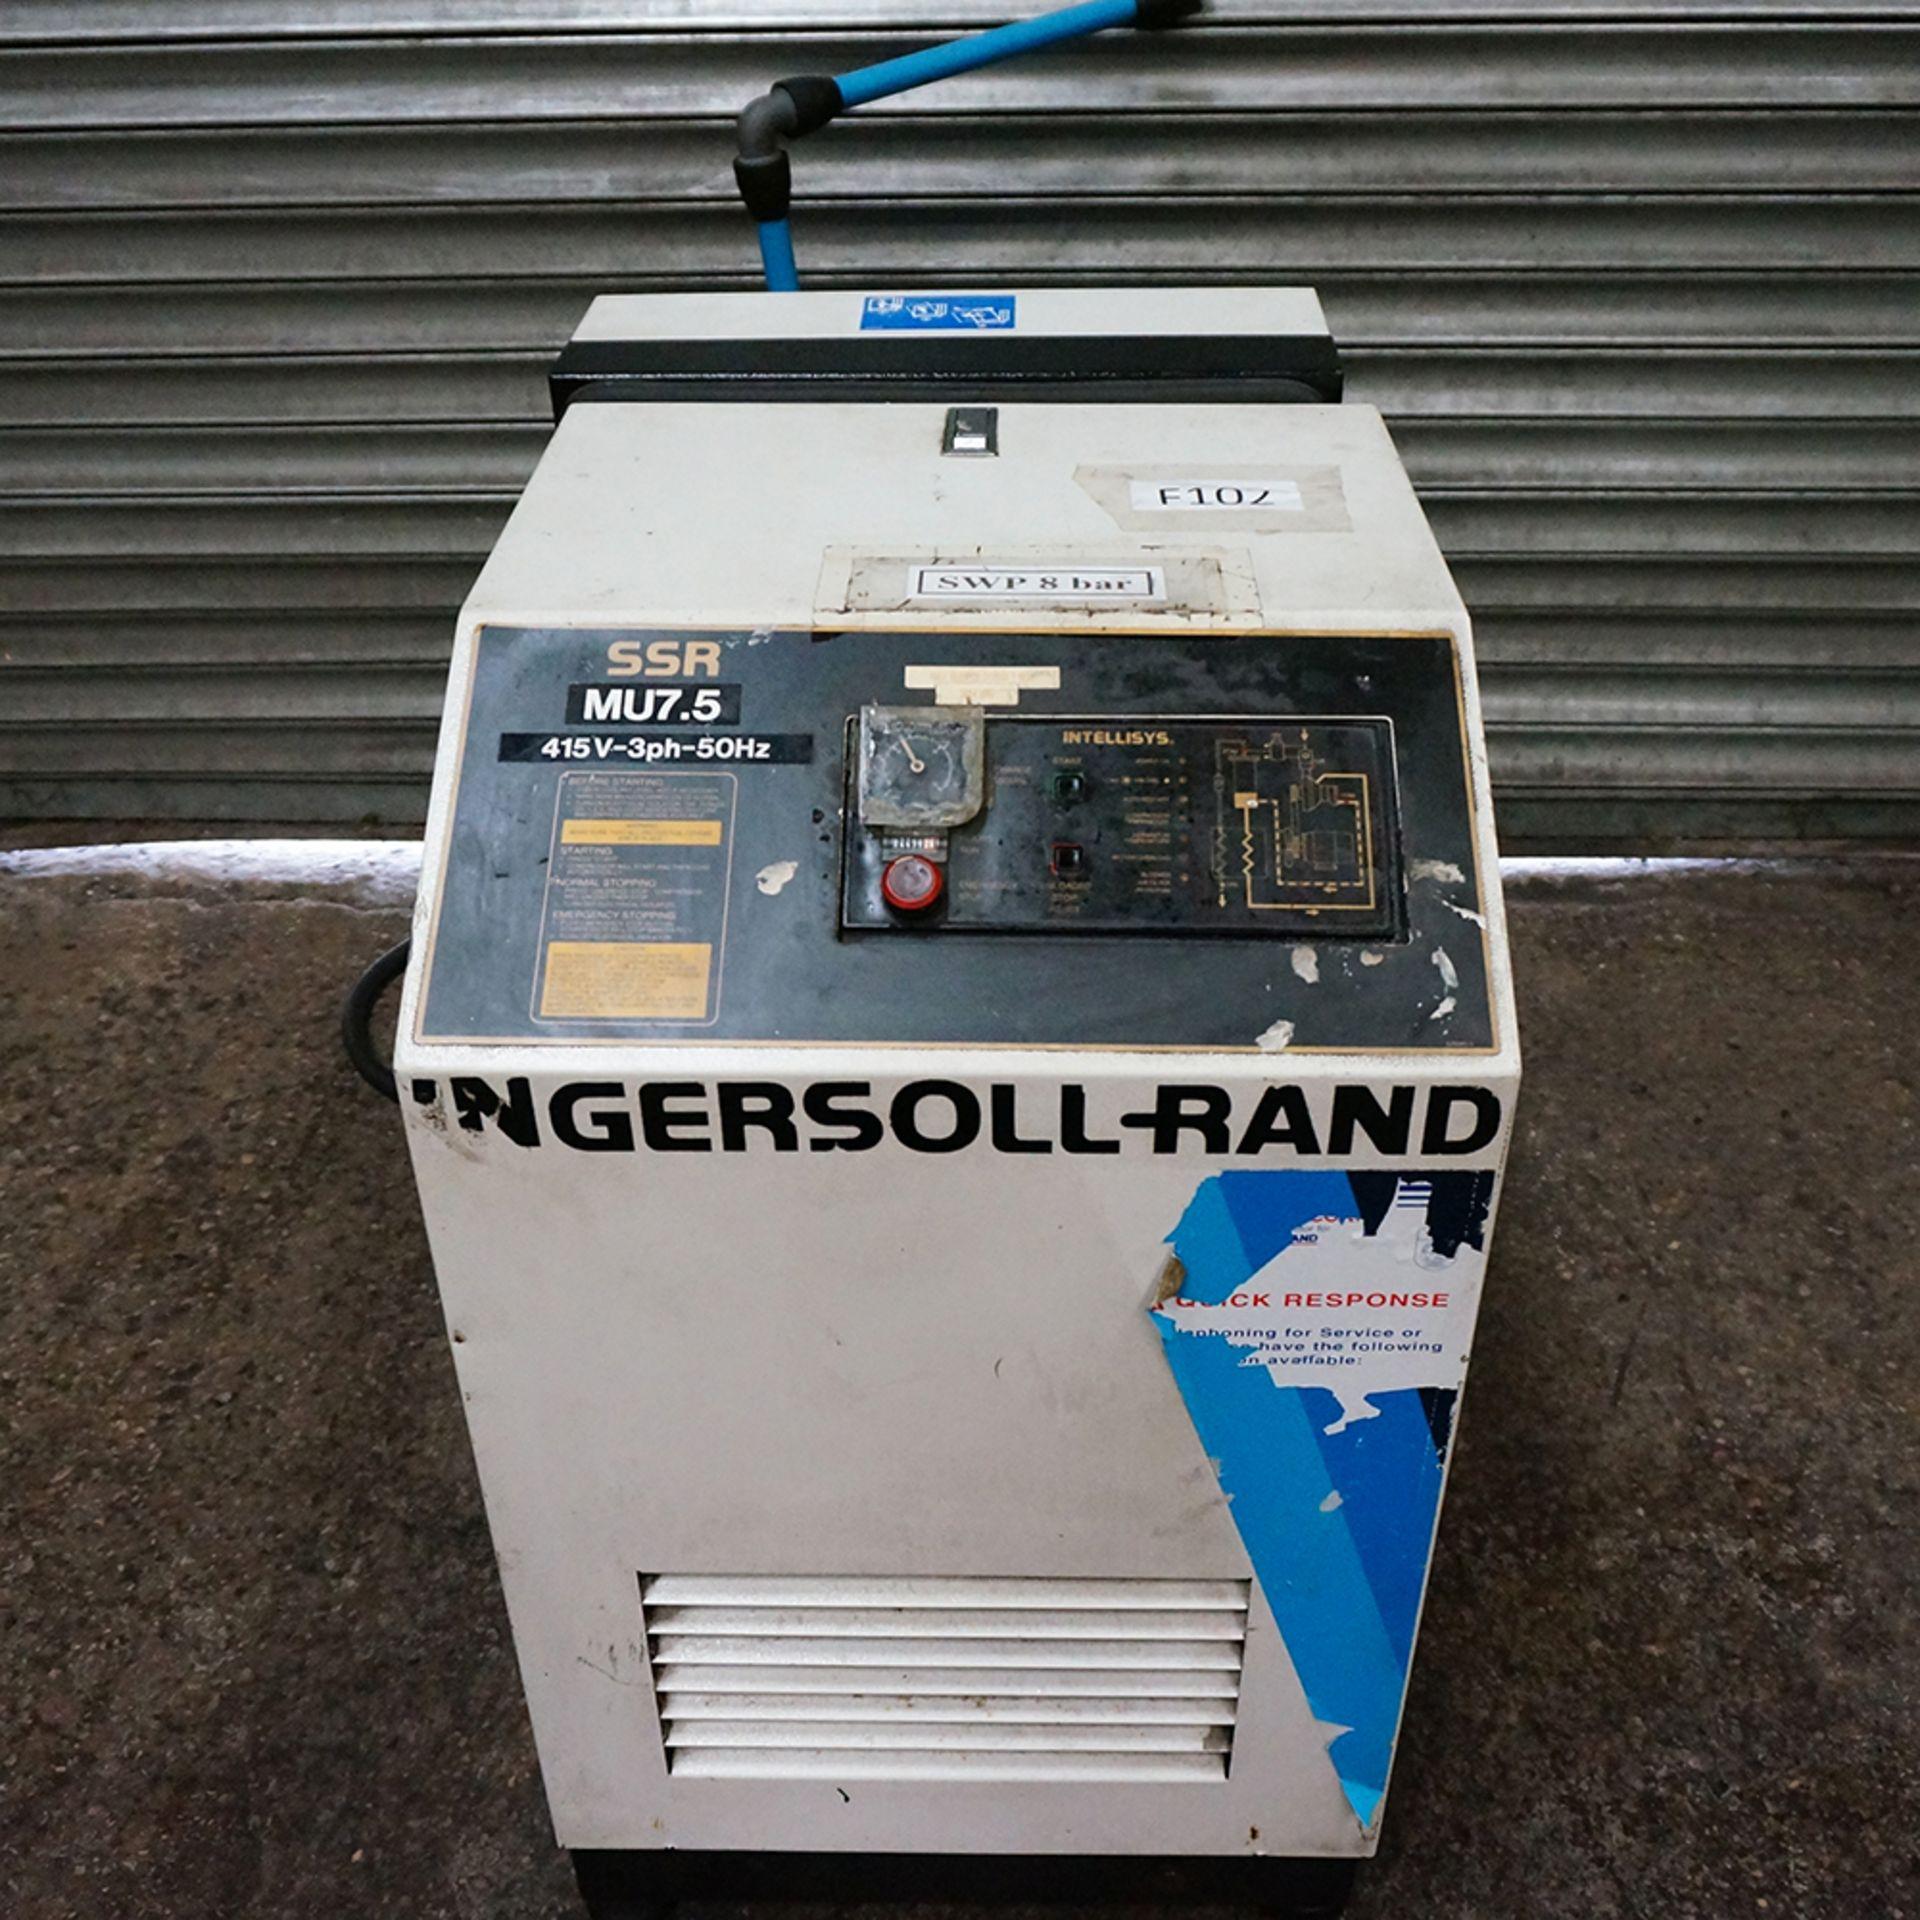 Lot 26 - Ingersoll Rand Model SSR MV7.5 Air Compressor